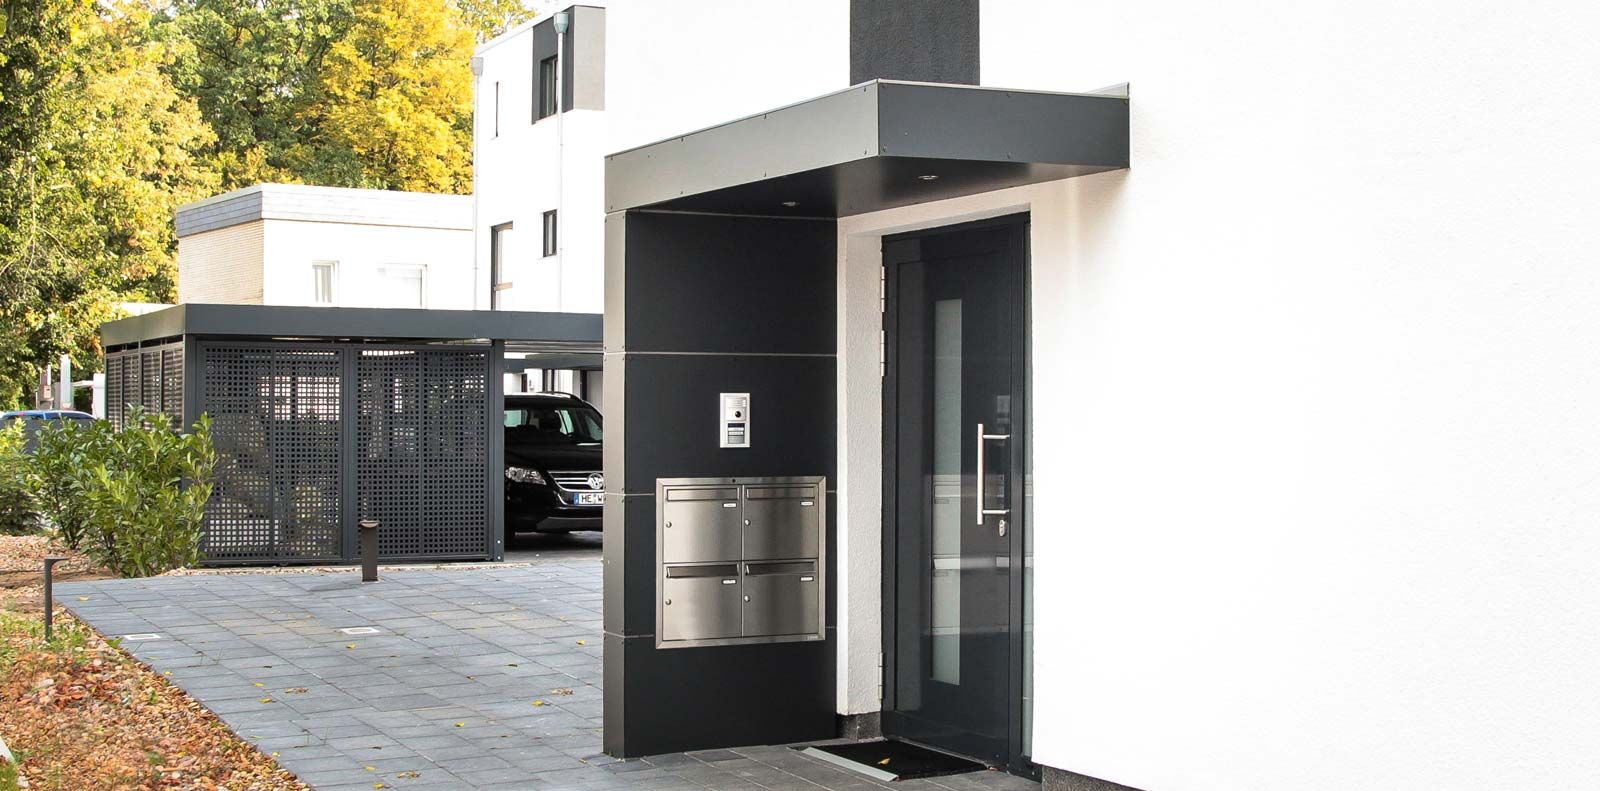 siebau haust r berdachung eingangs berdachung mit trespa fassadenplat carport einhausungen. Black Bedroom Furniture Sets. Home Design Ideas